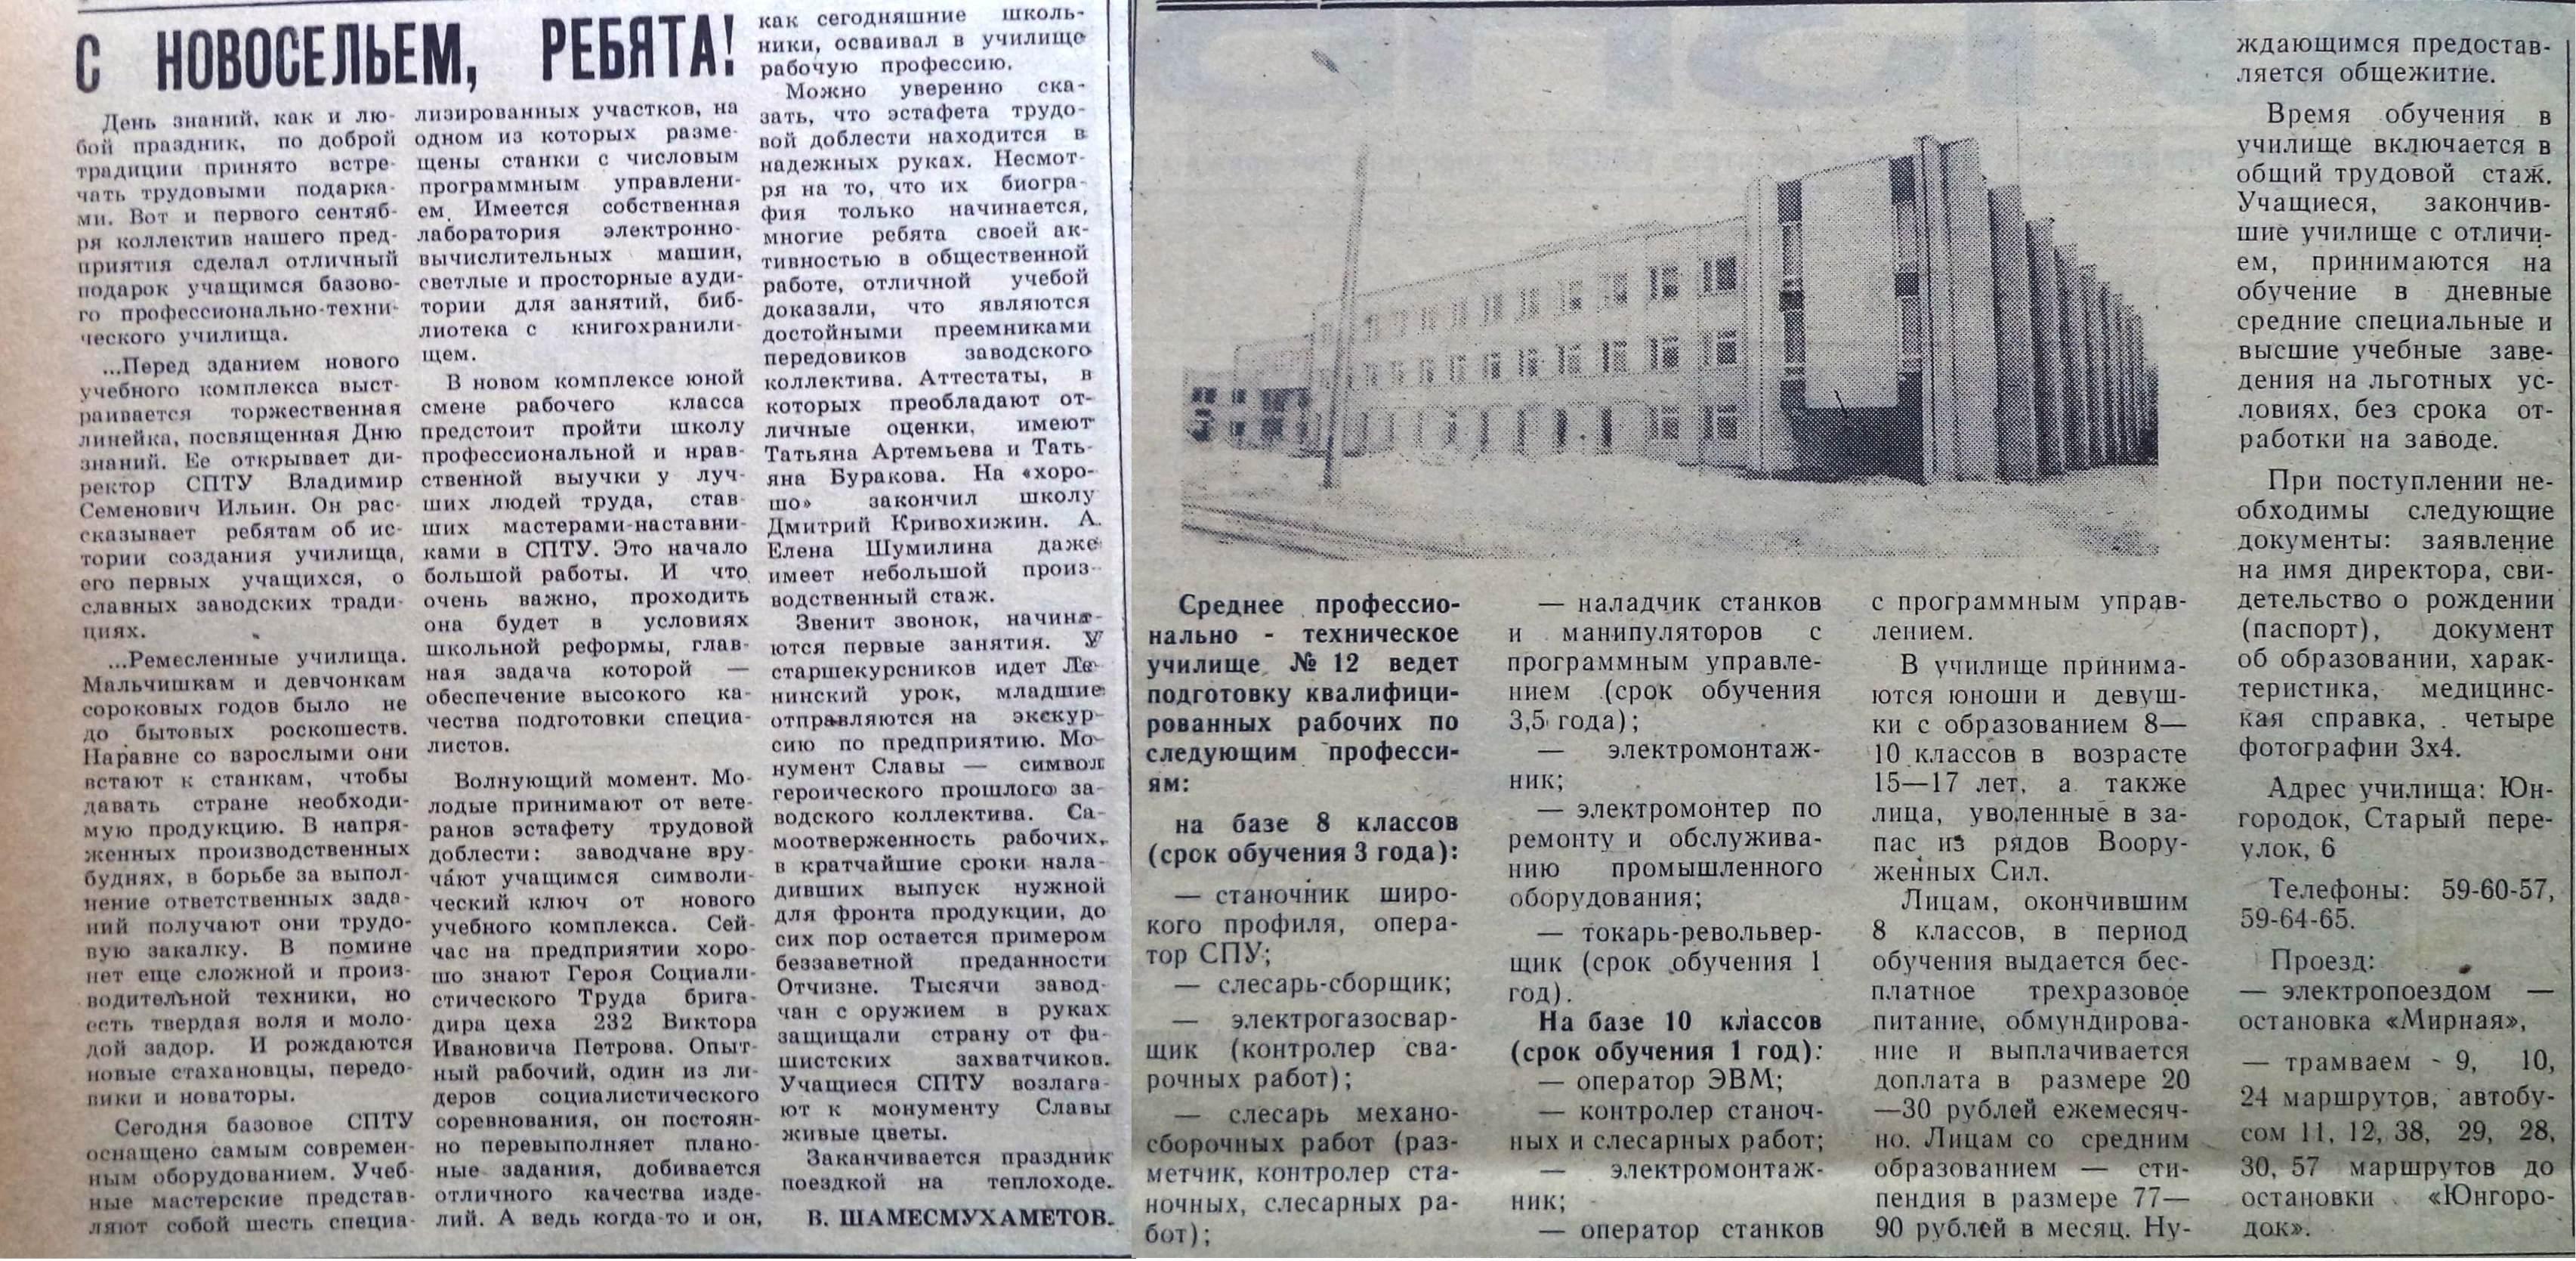 Стар-Стац-ФОТО-58-Заводская жизнь-1986-5 сентября-min-min